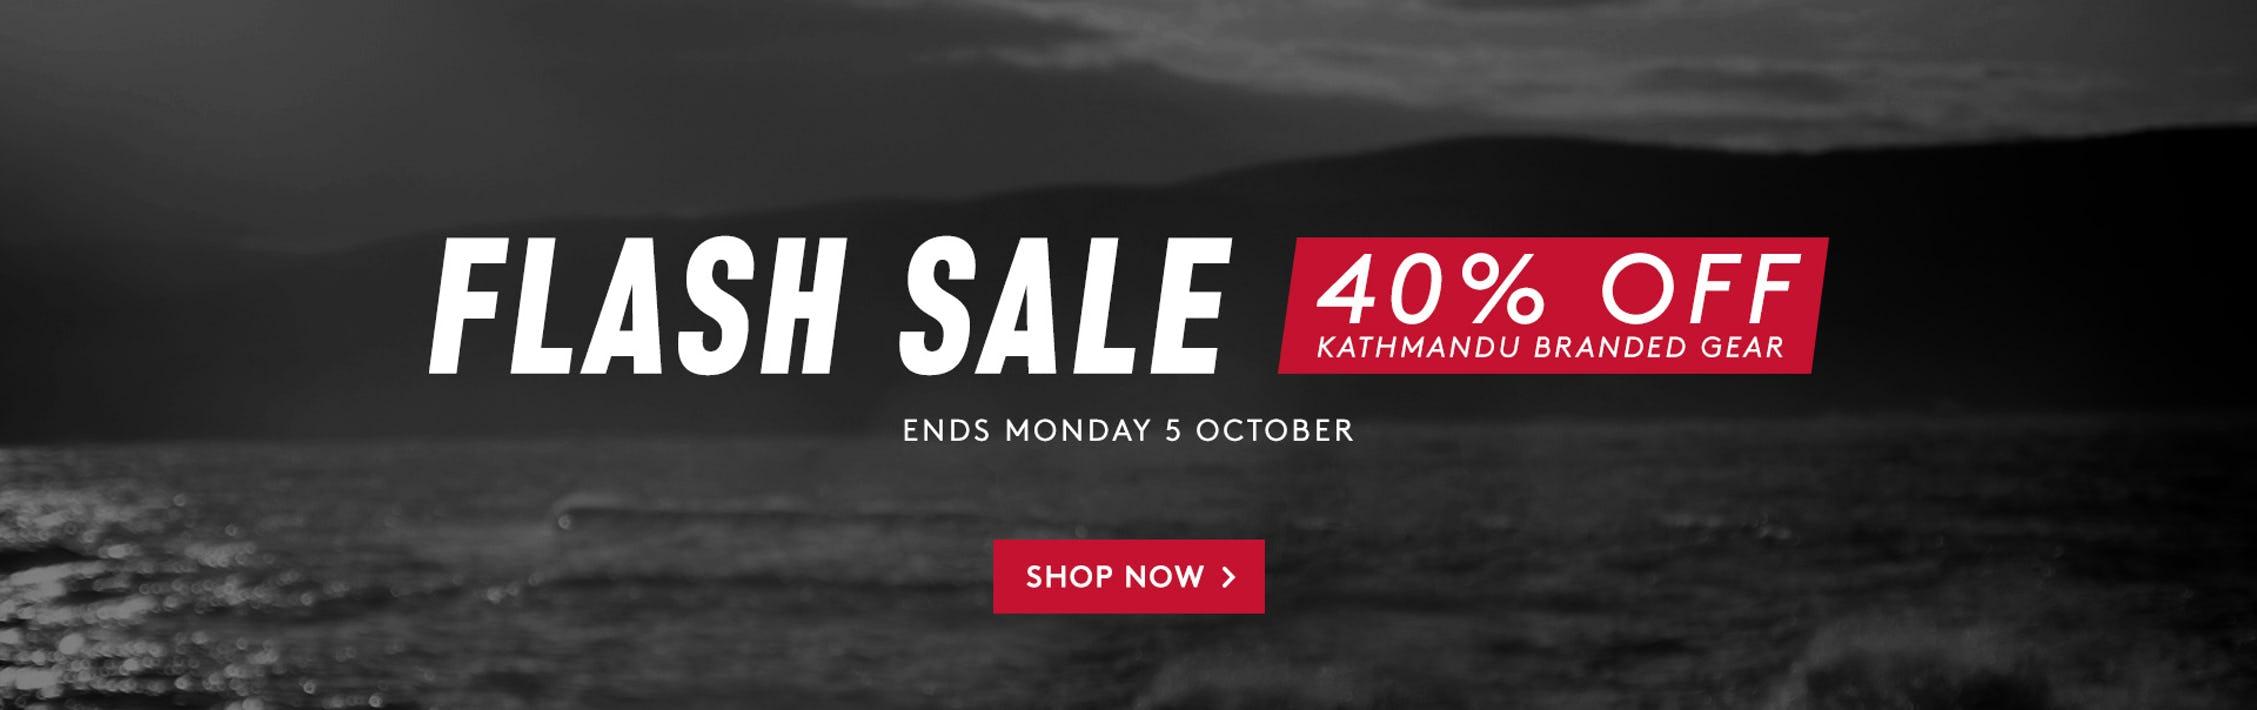 Flash Sale   40% off Kathmandu Branded Gear